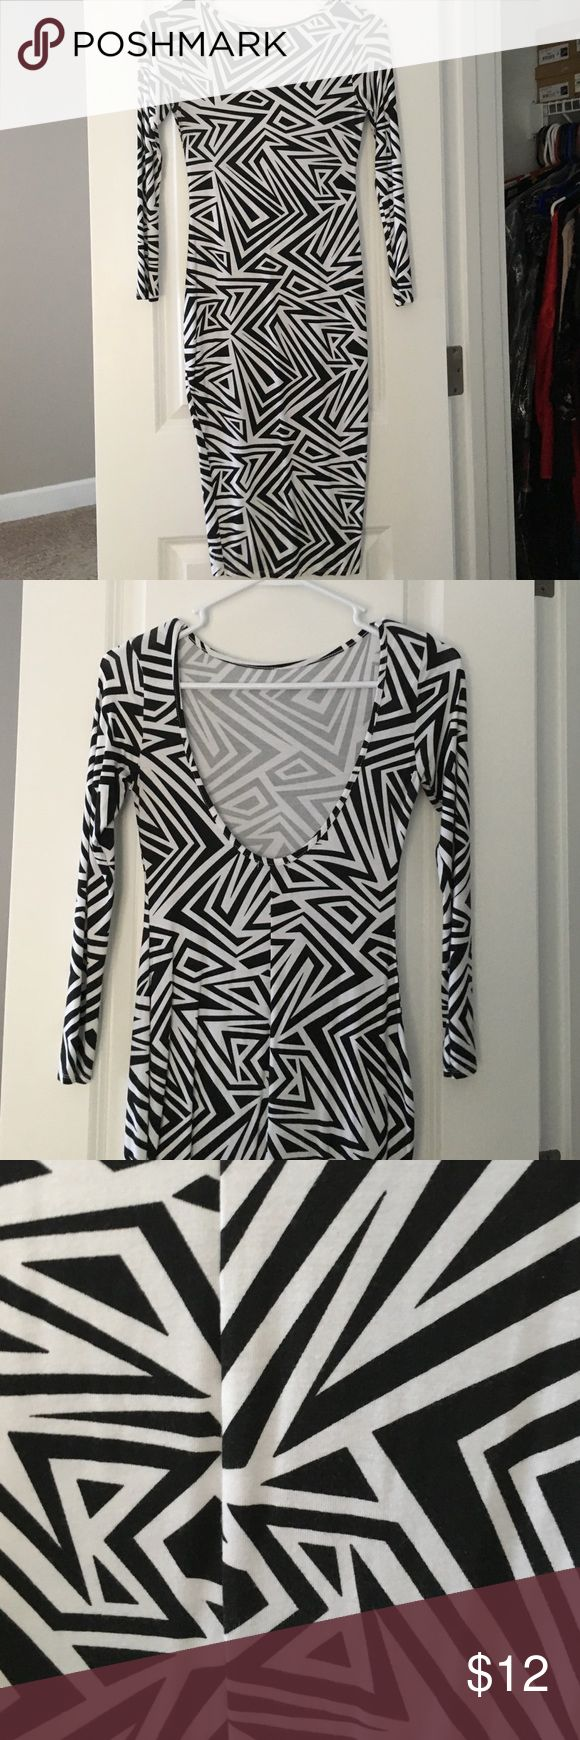 Black and white pencil dress Black and white zig-zag dress. 3/4 sleeves. Low back. Midi ASOS Dresses Midi